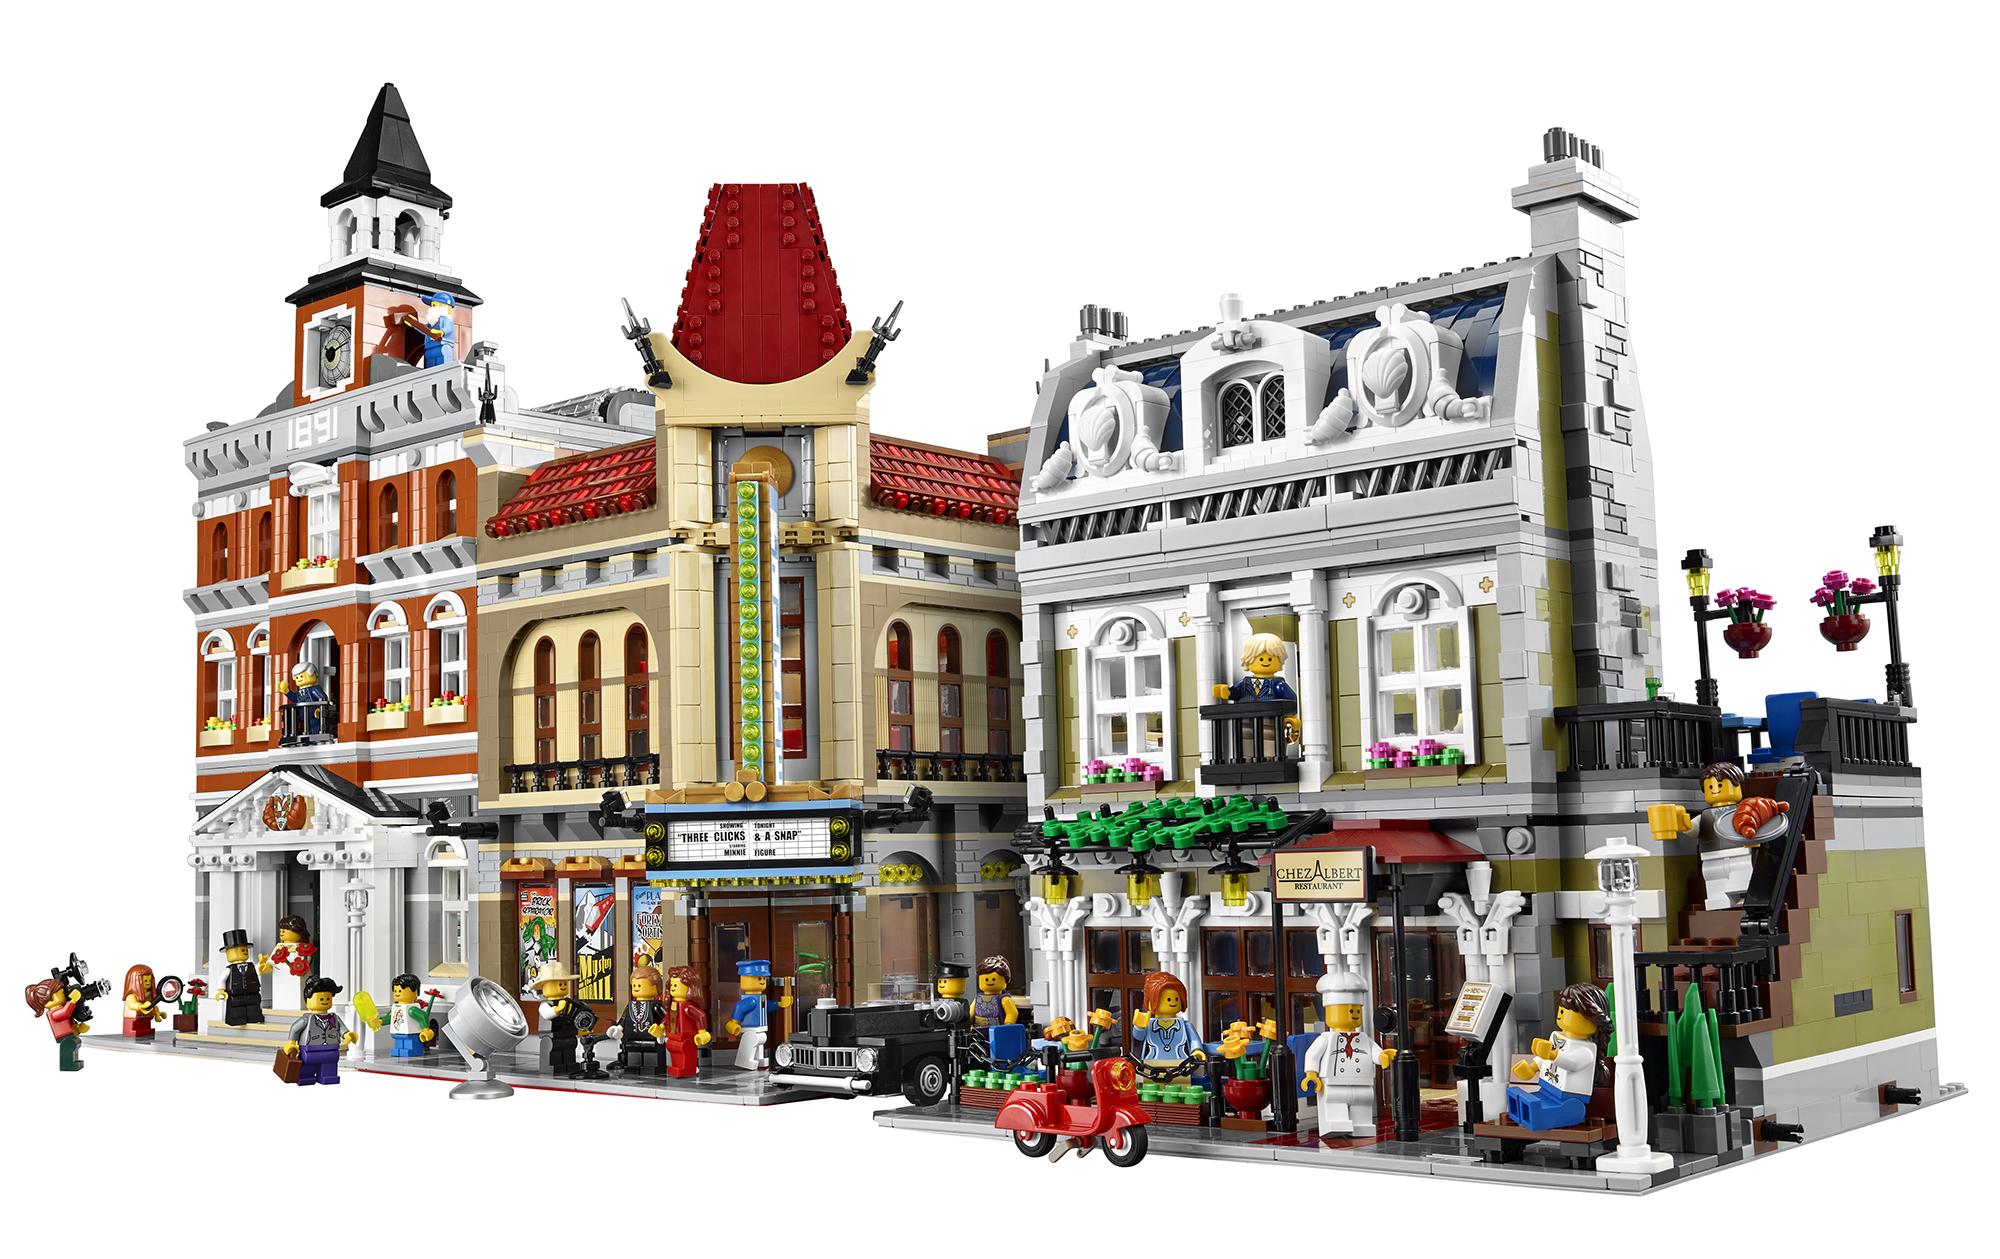 Lego Headquarters 2014 Lego Parisian Restaurant 10243 Modular Building Photo